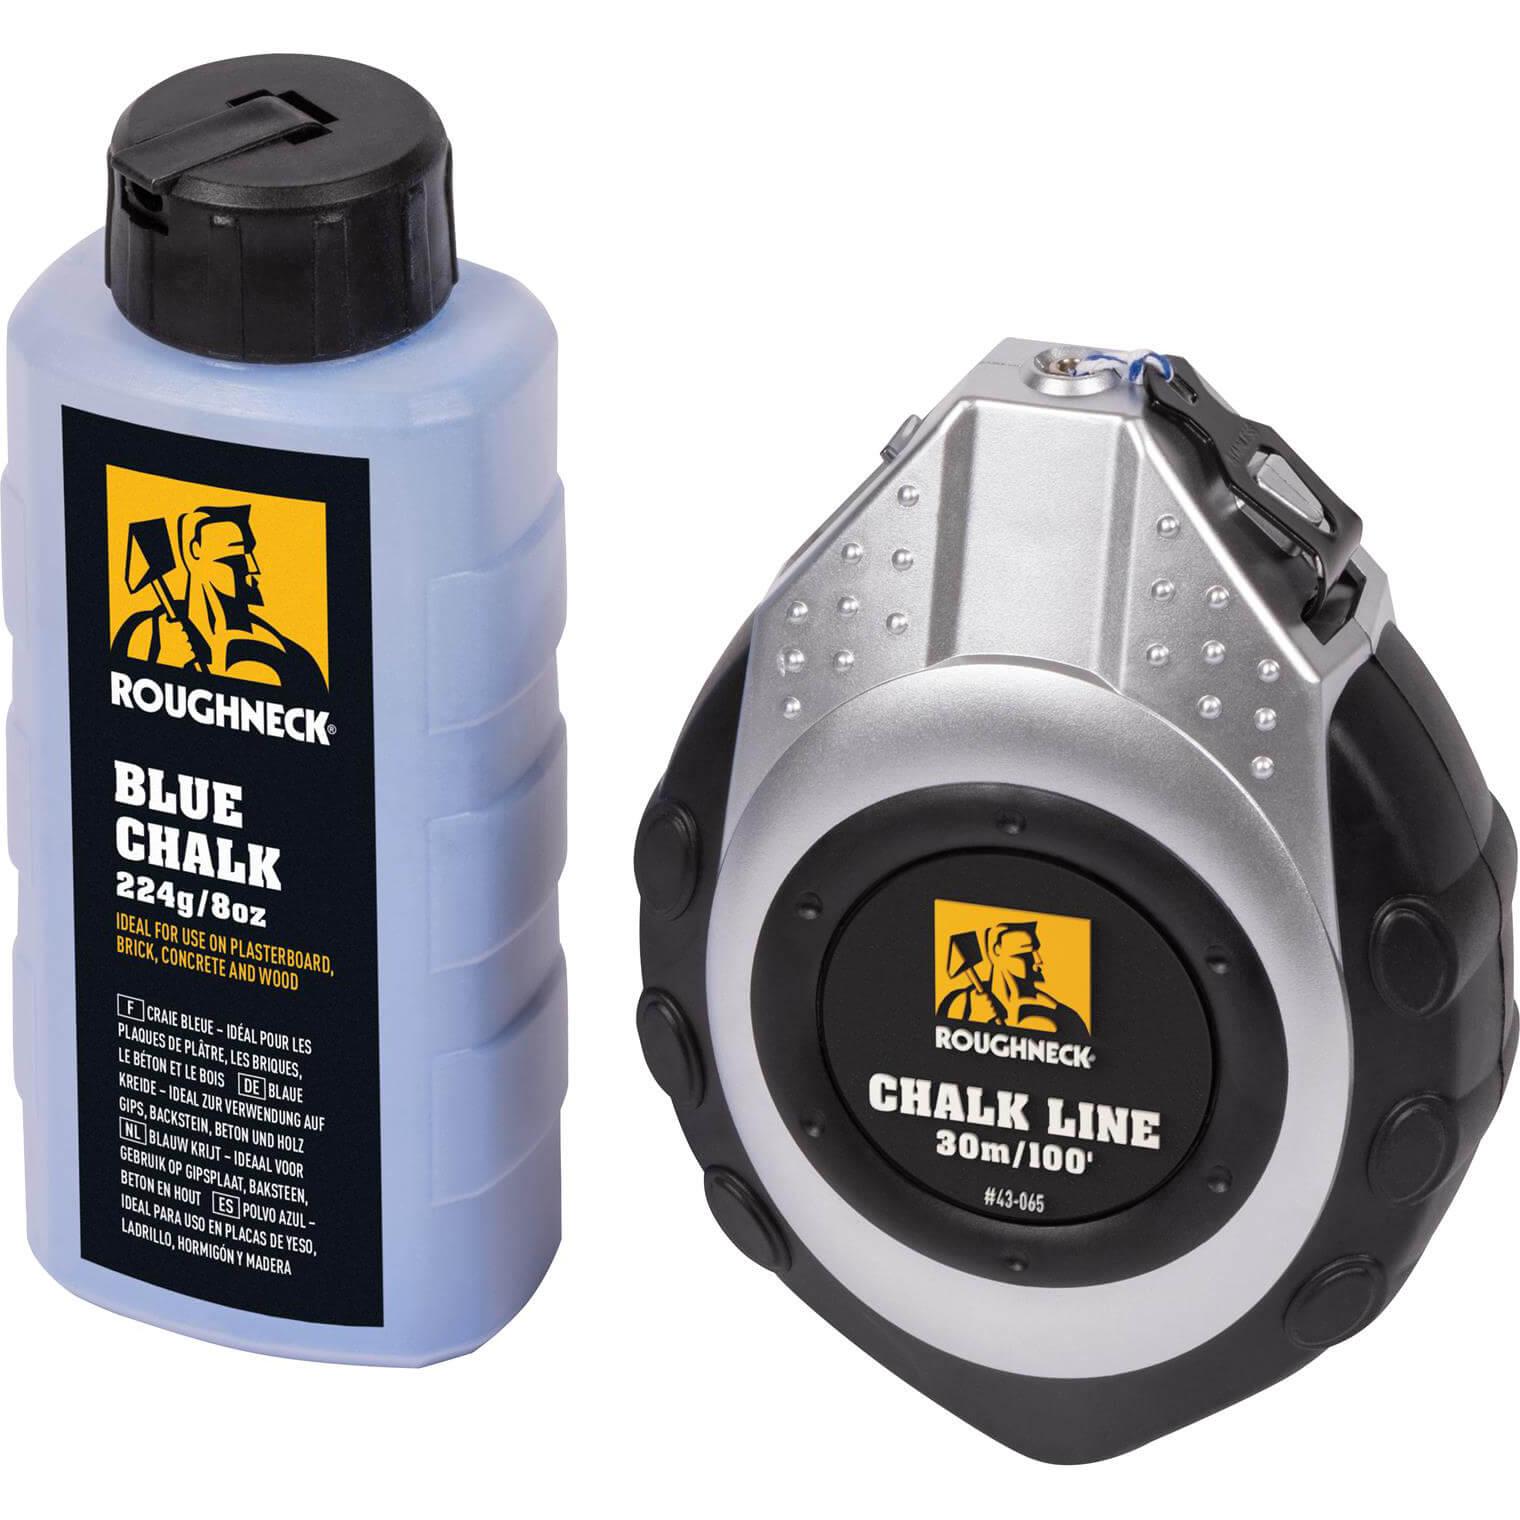 43-065 30m Chalk Line /& Blue Chalk Roughneck